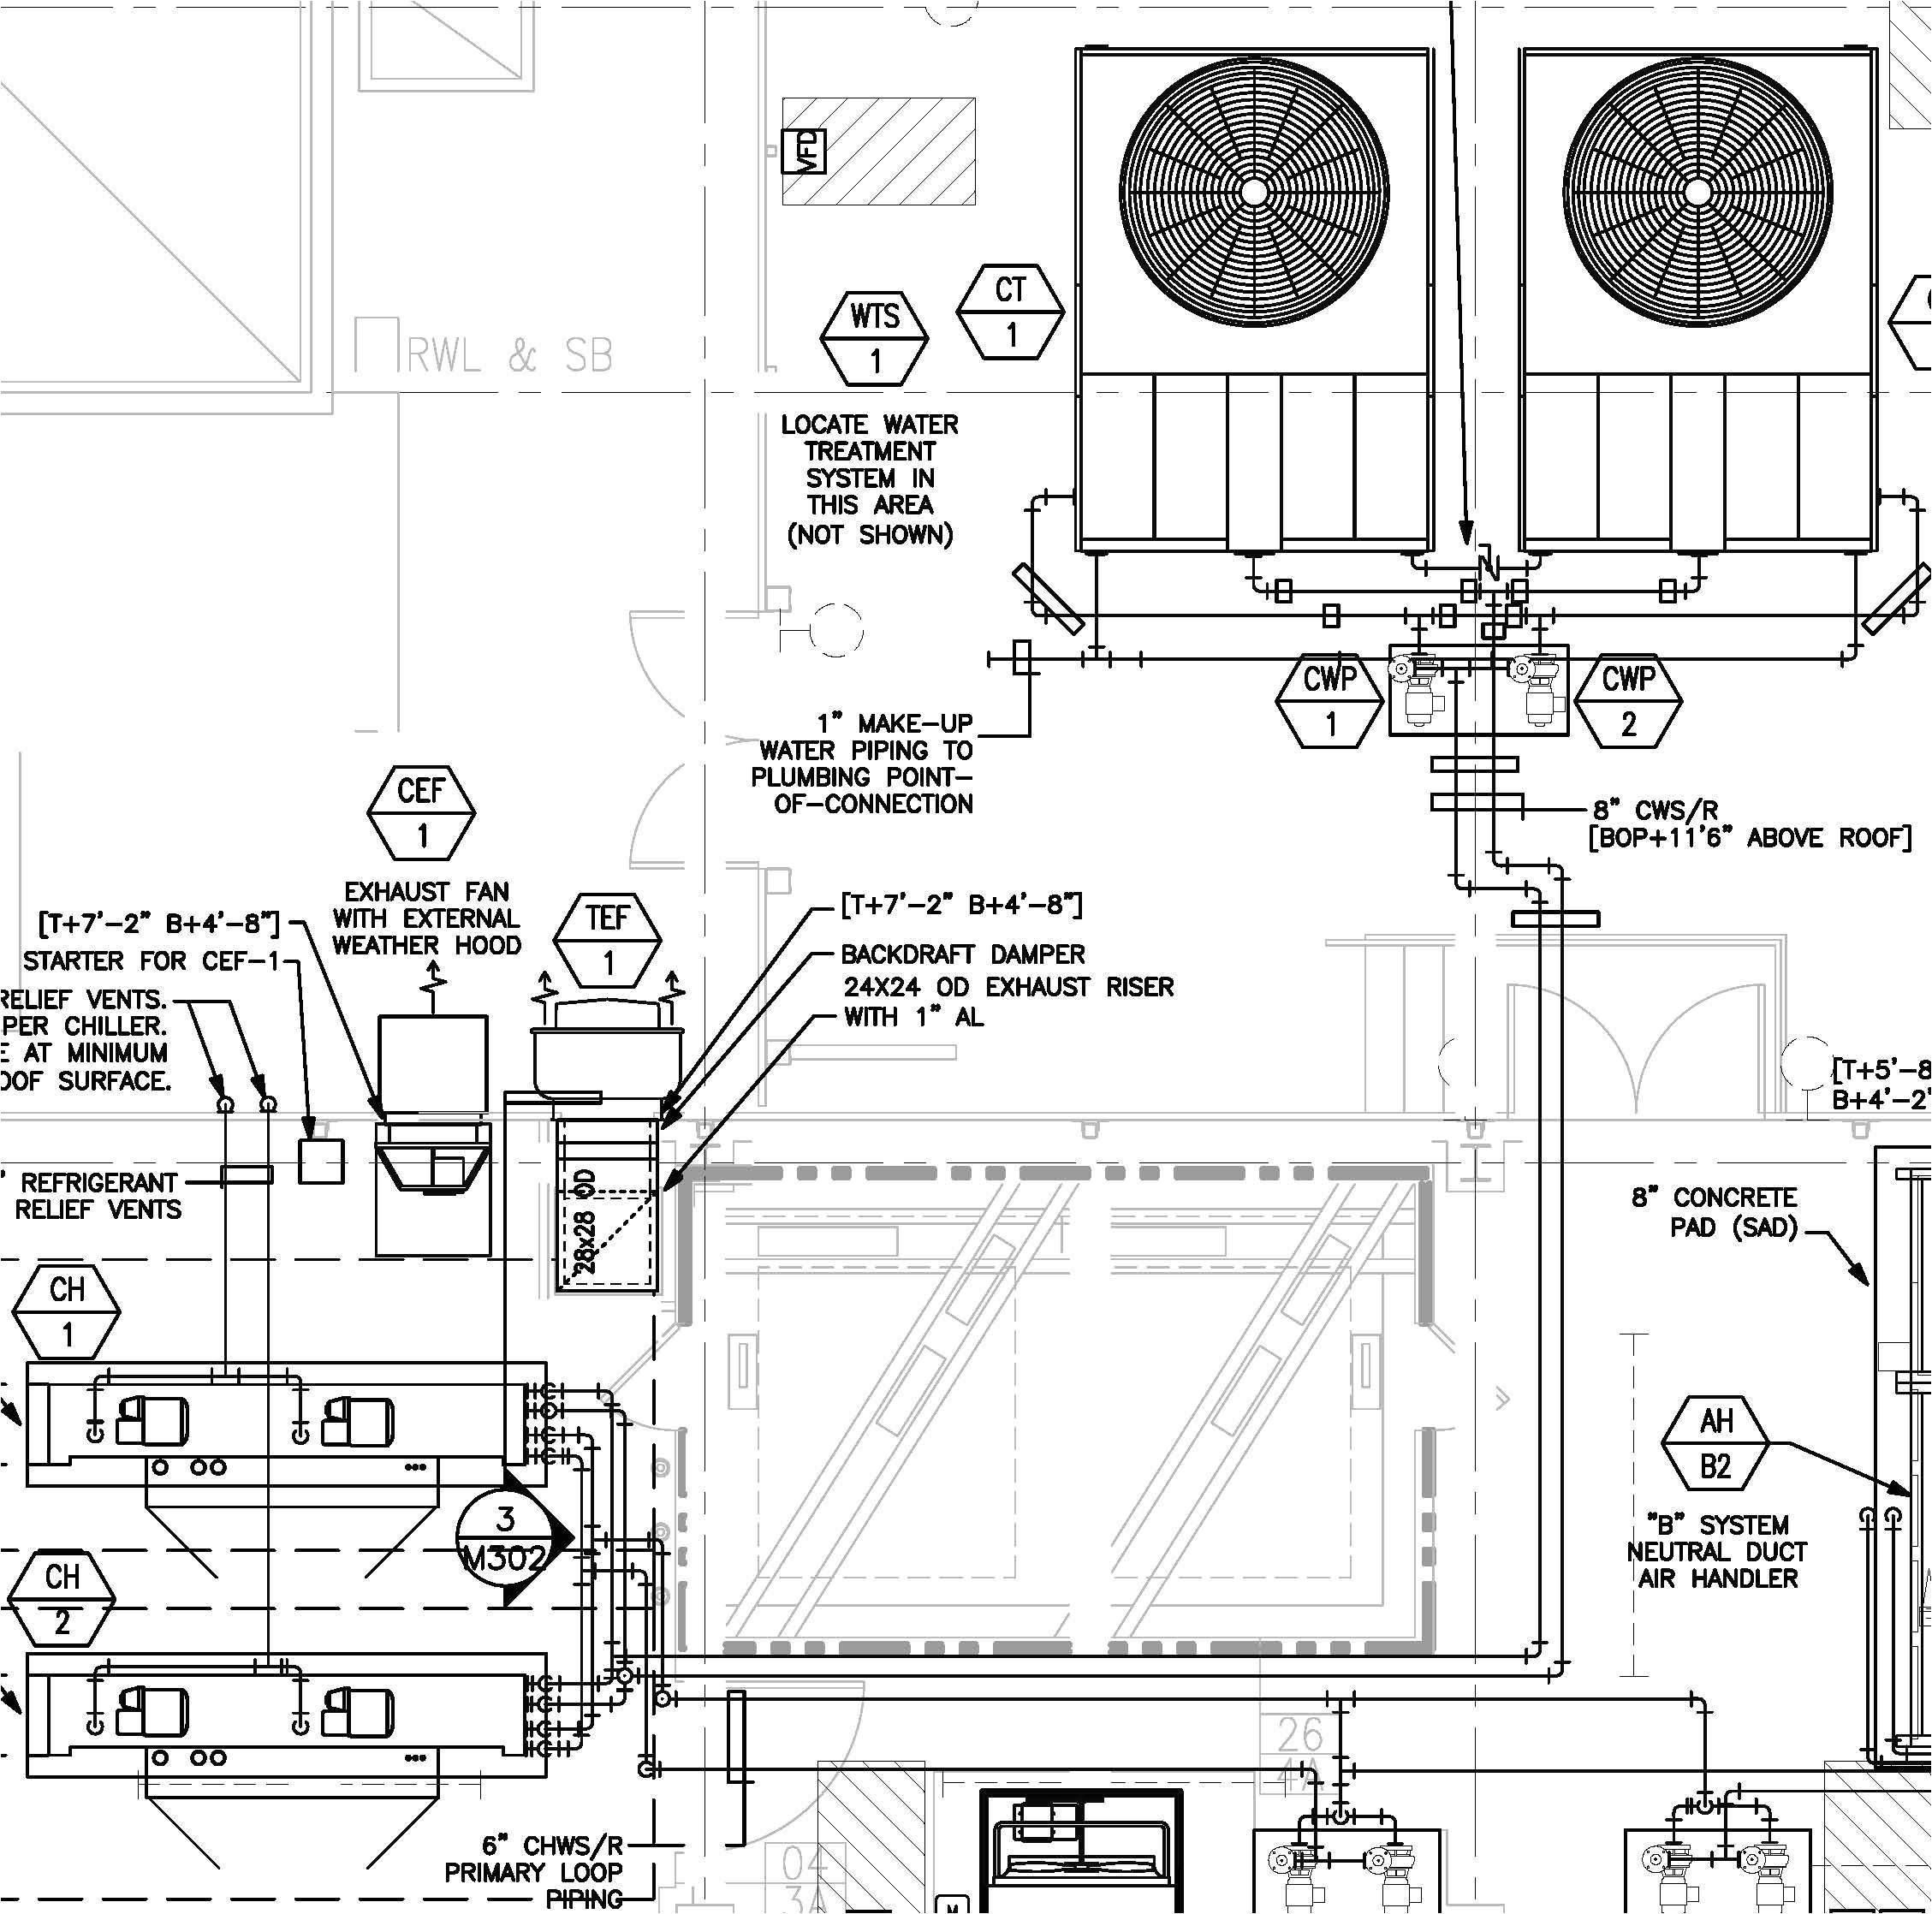 kohler wiring diagrams wiring diagram databasekohler k301 wiring diagram